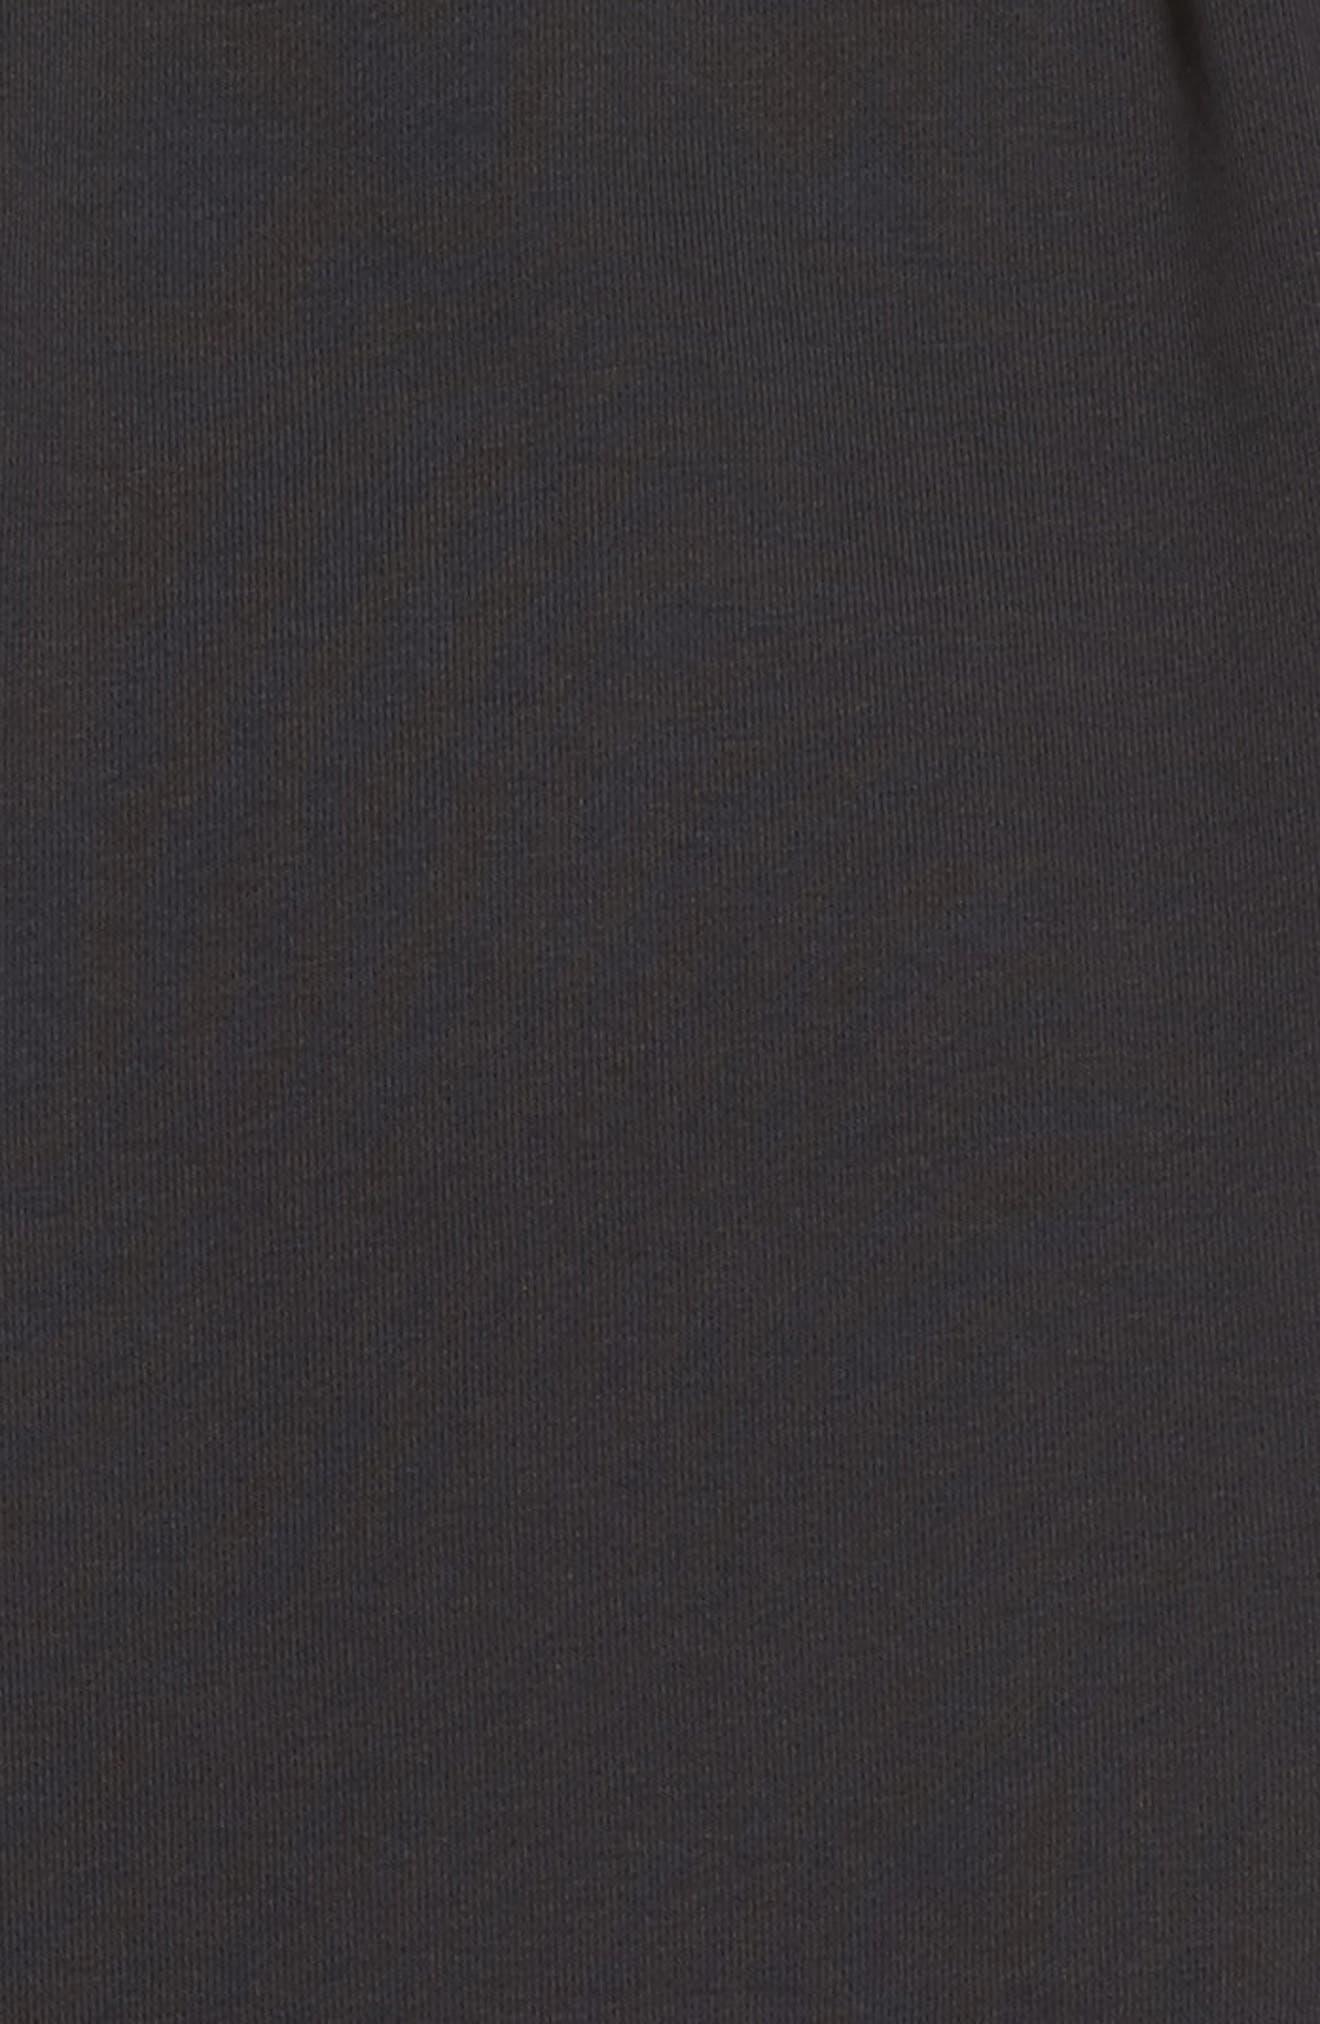 Dry Wrap Training Hoodie,                             Alternate thumbnail 7, color,                             Black/ Gunsmoke/ Black